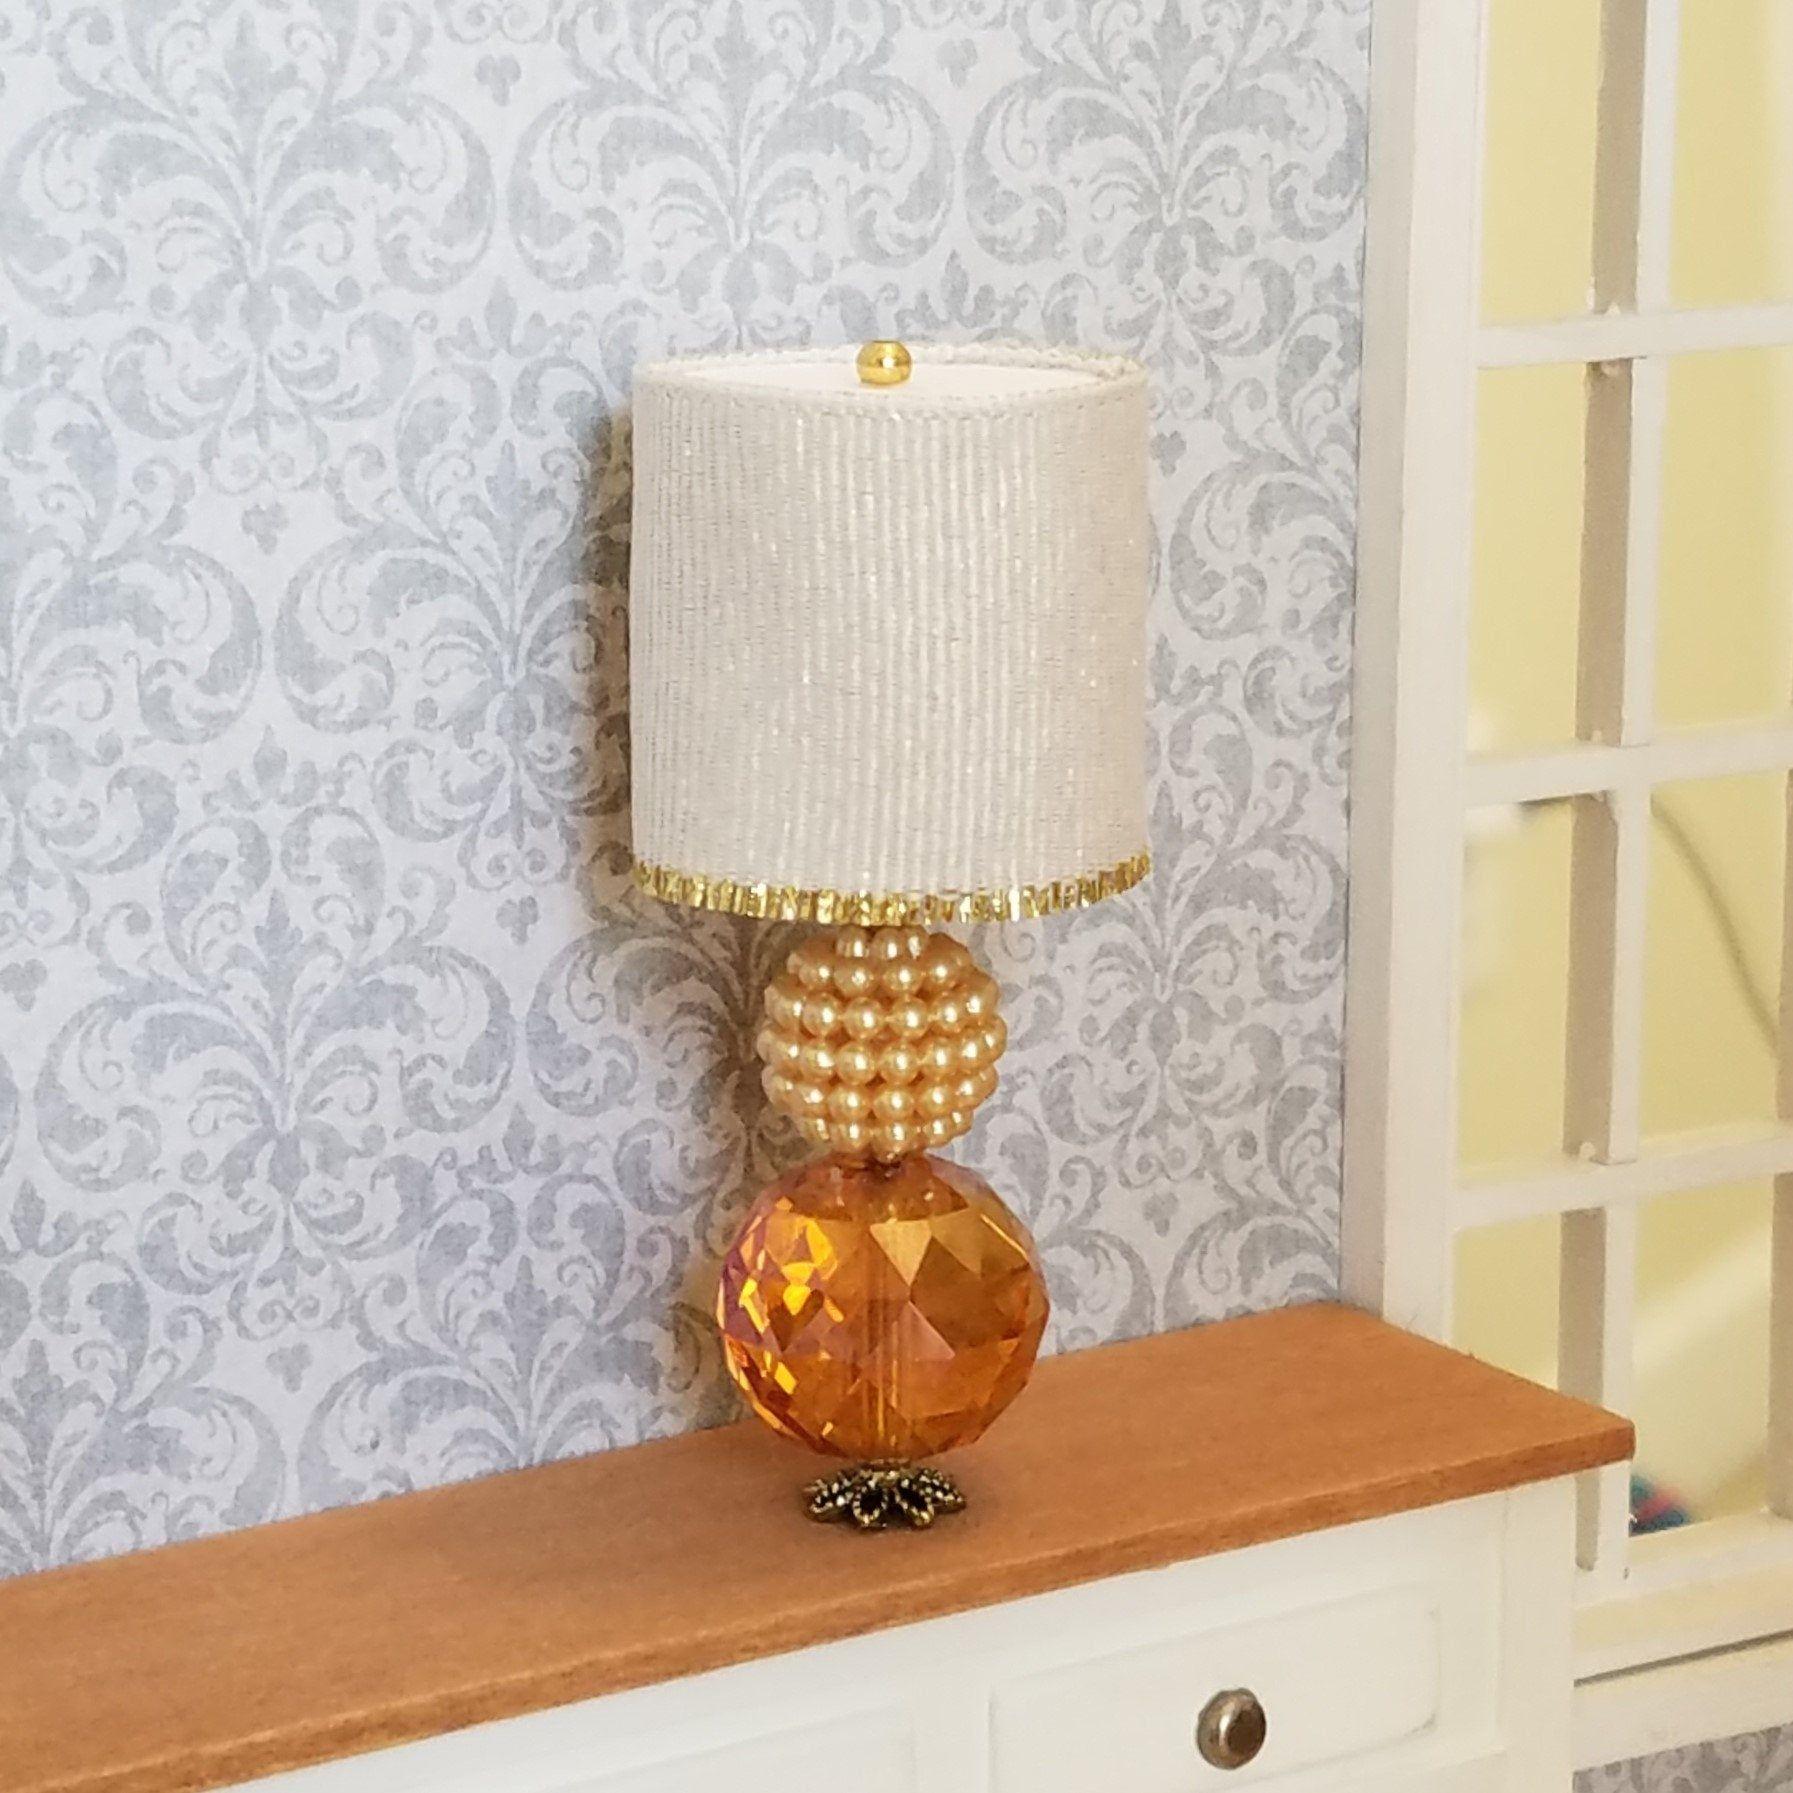 Miniature Lamps Miniature Table Lamps Dollhouse Lamp Amber